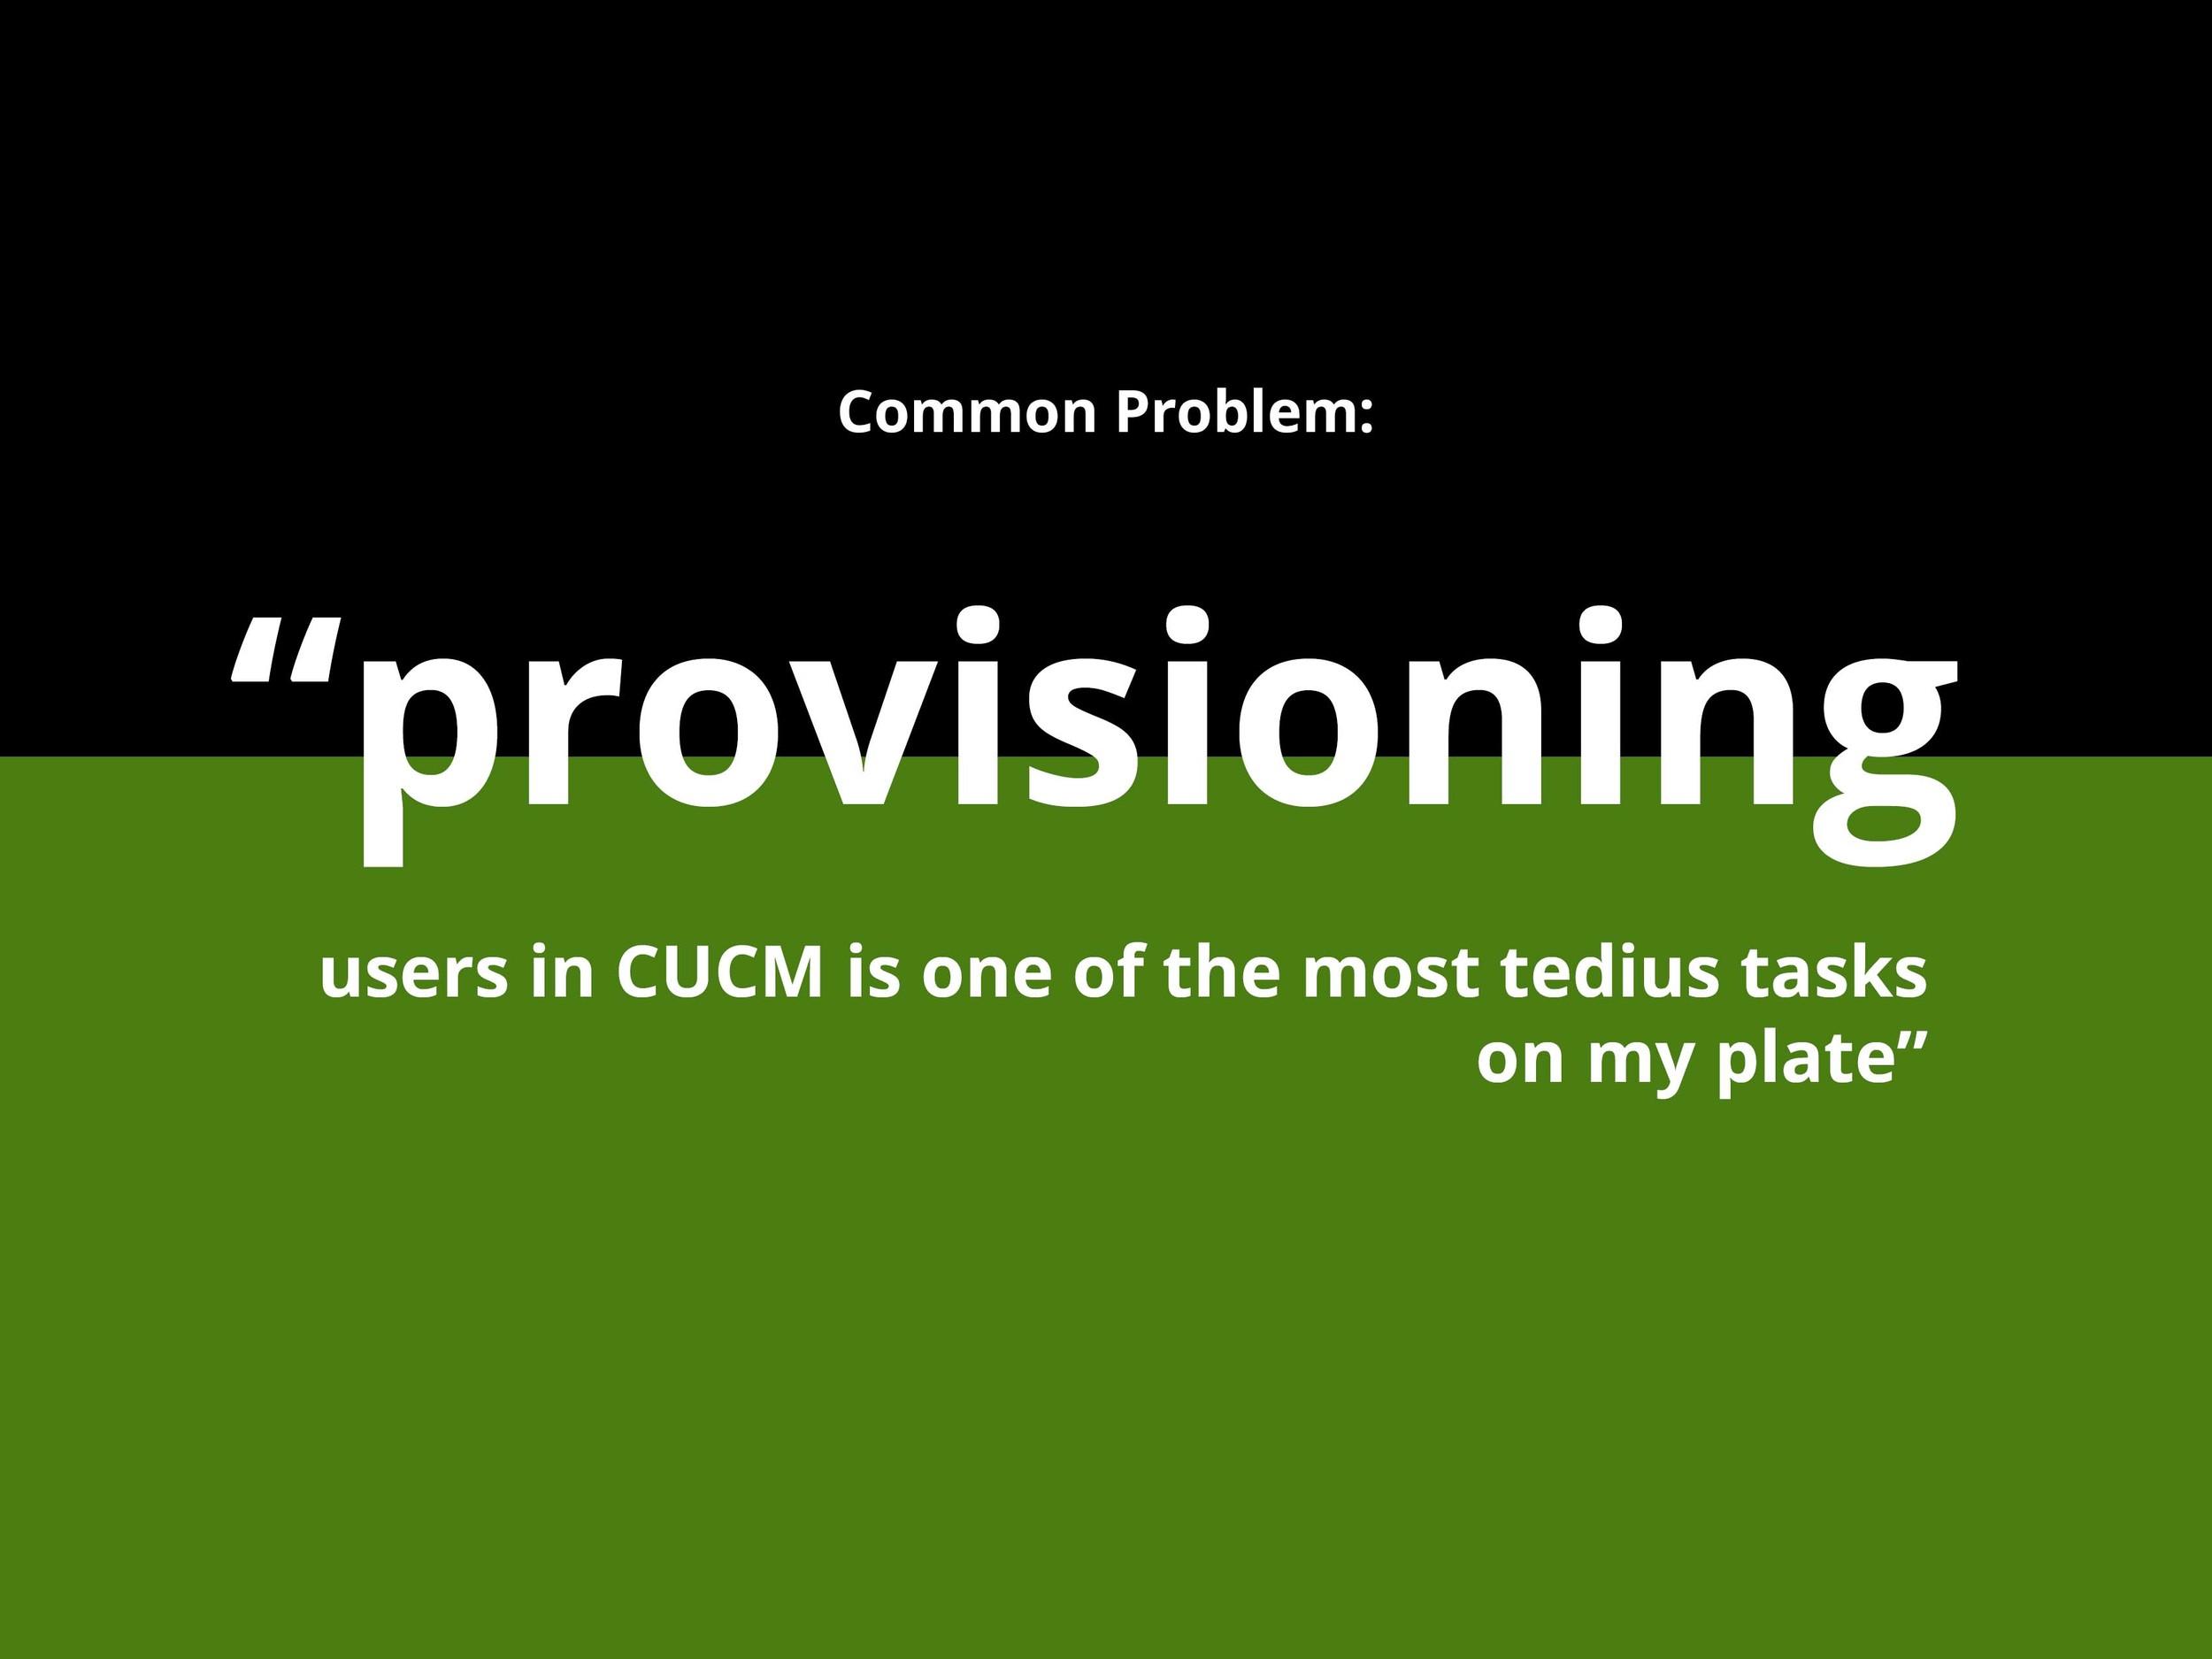 b2b presentation on provisioning_quote.jpg